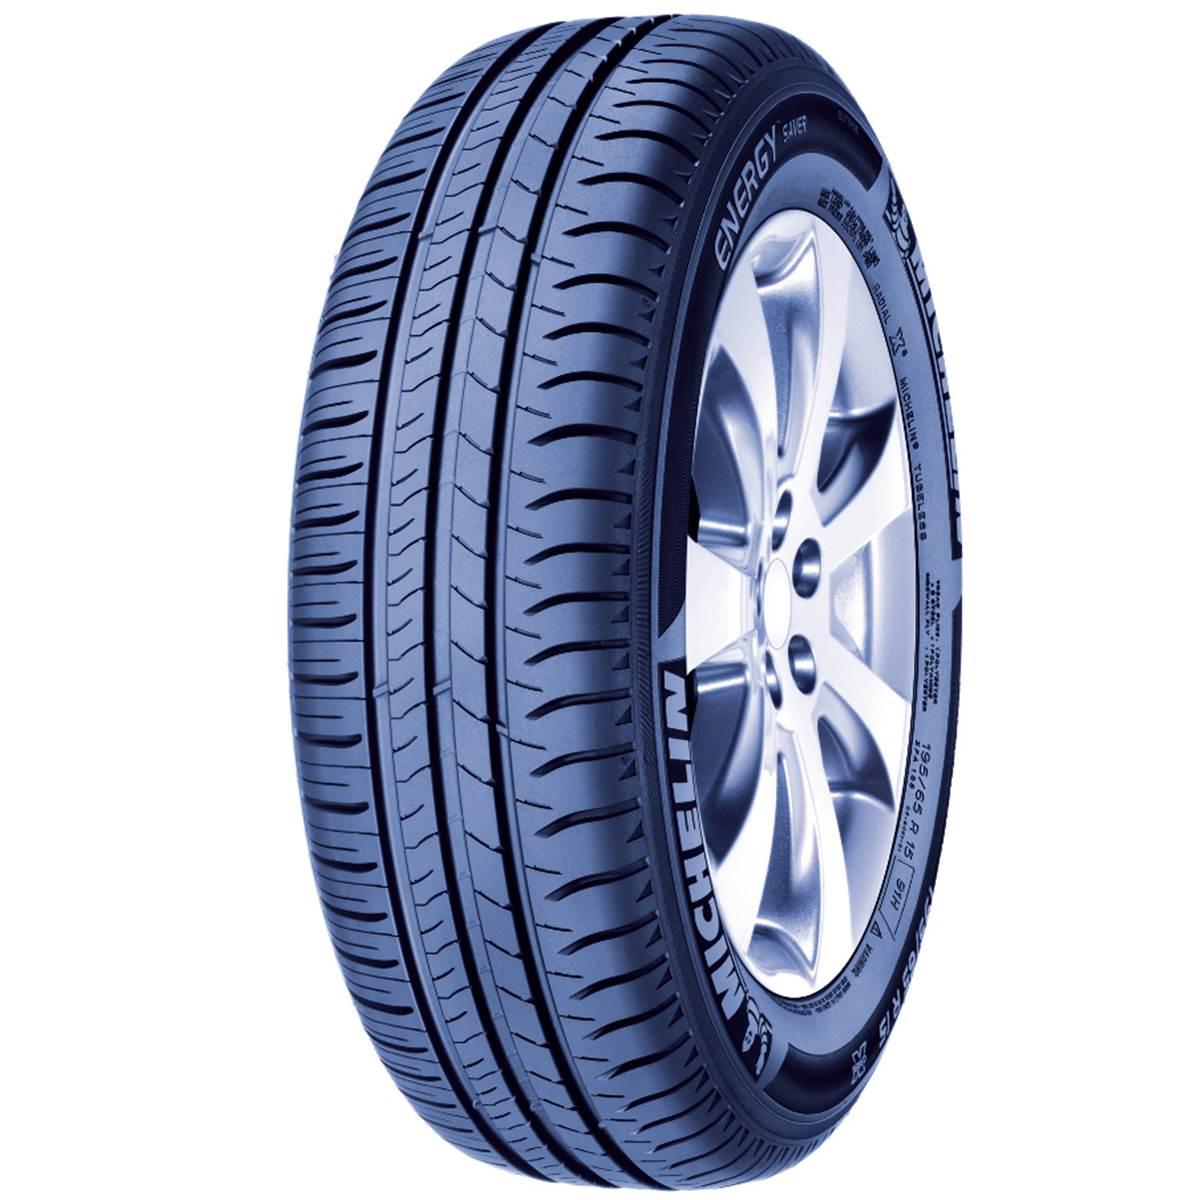 Pneu Michelin 195/55R16 87H Energy Saver